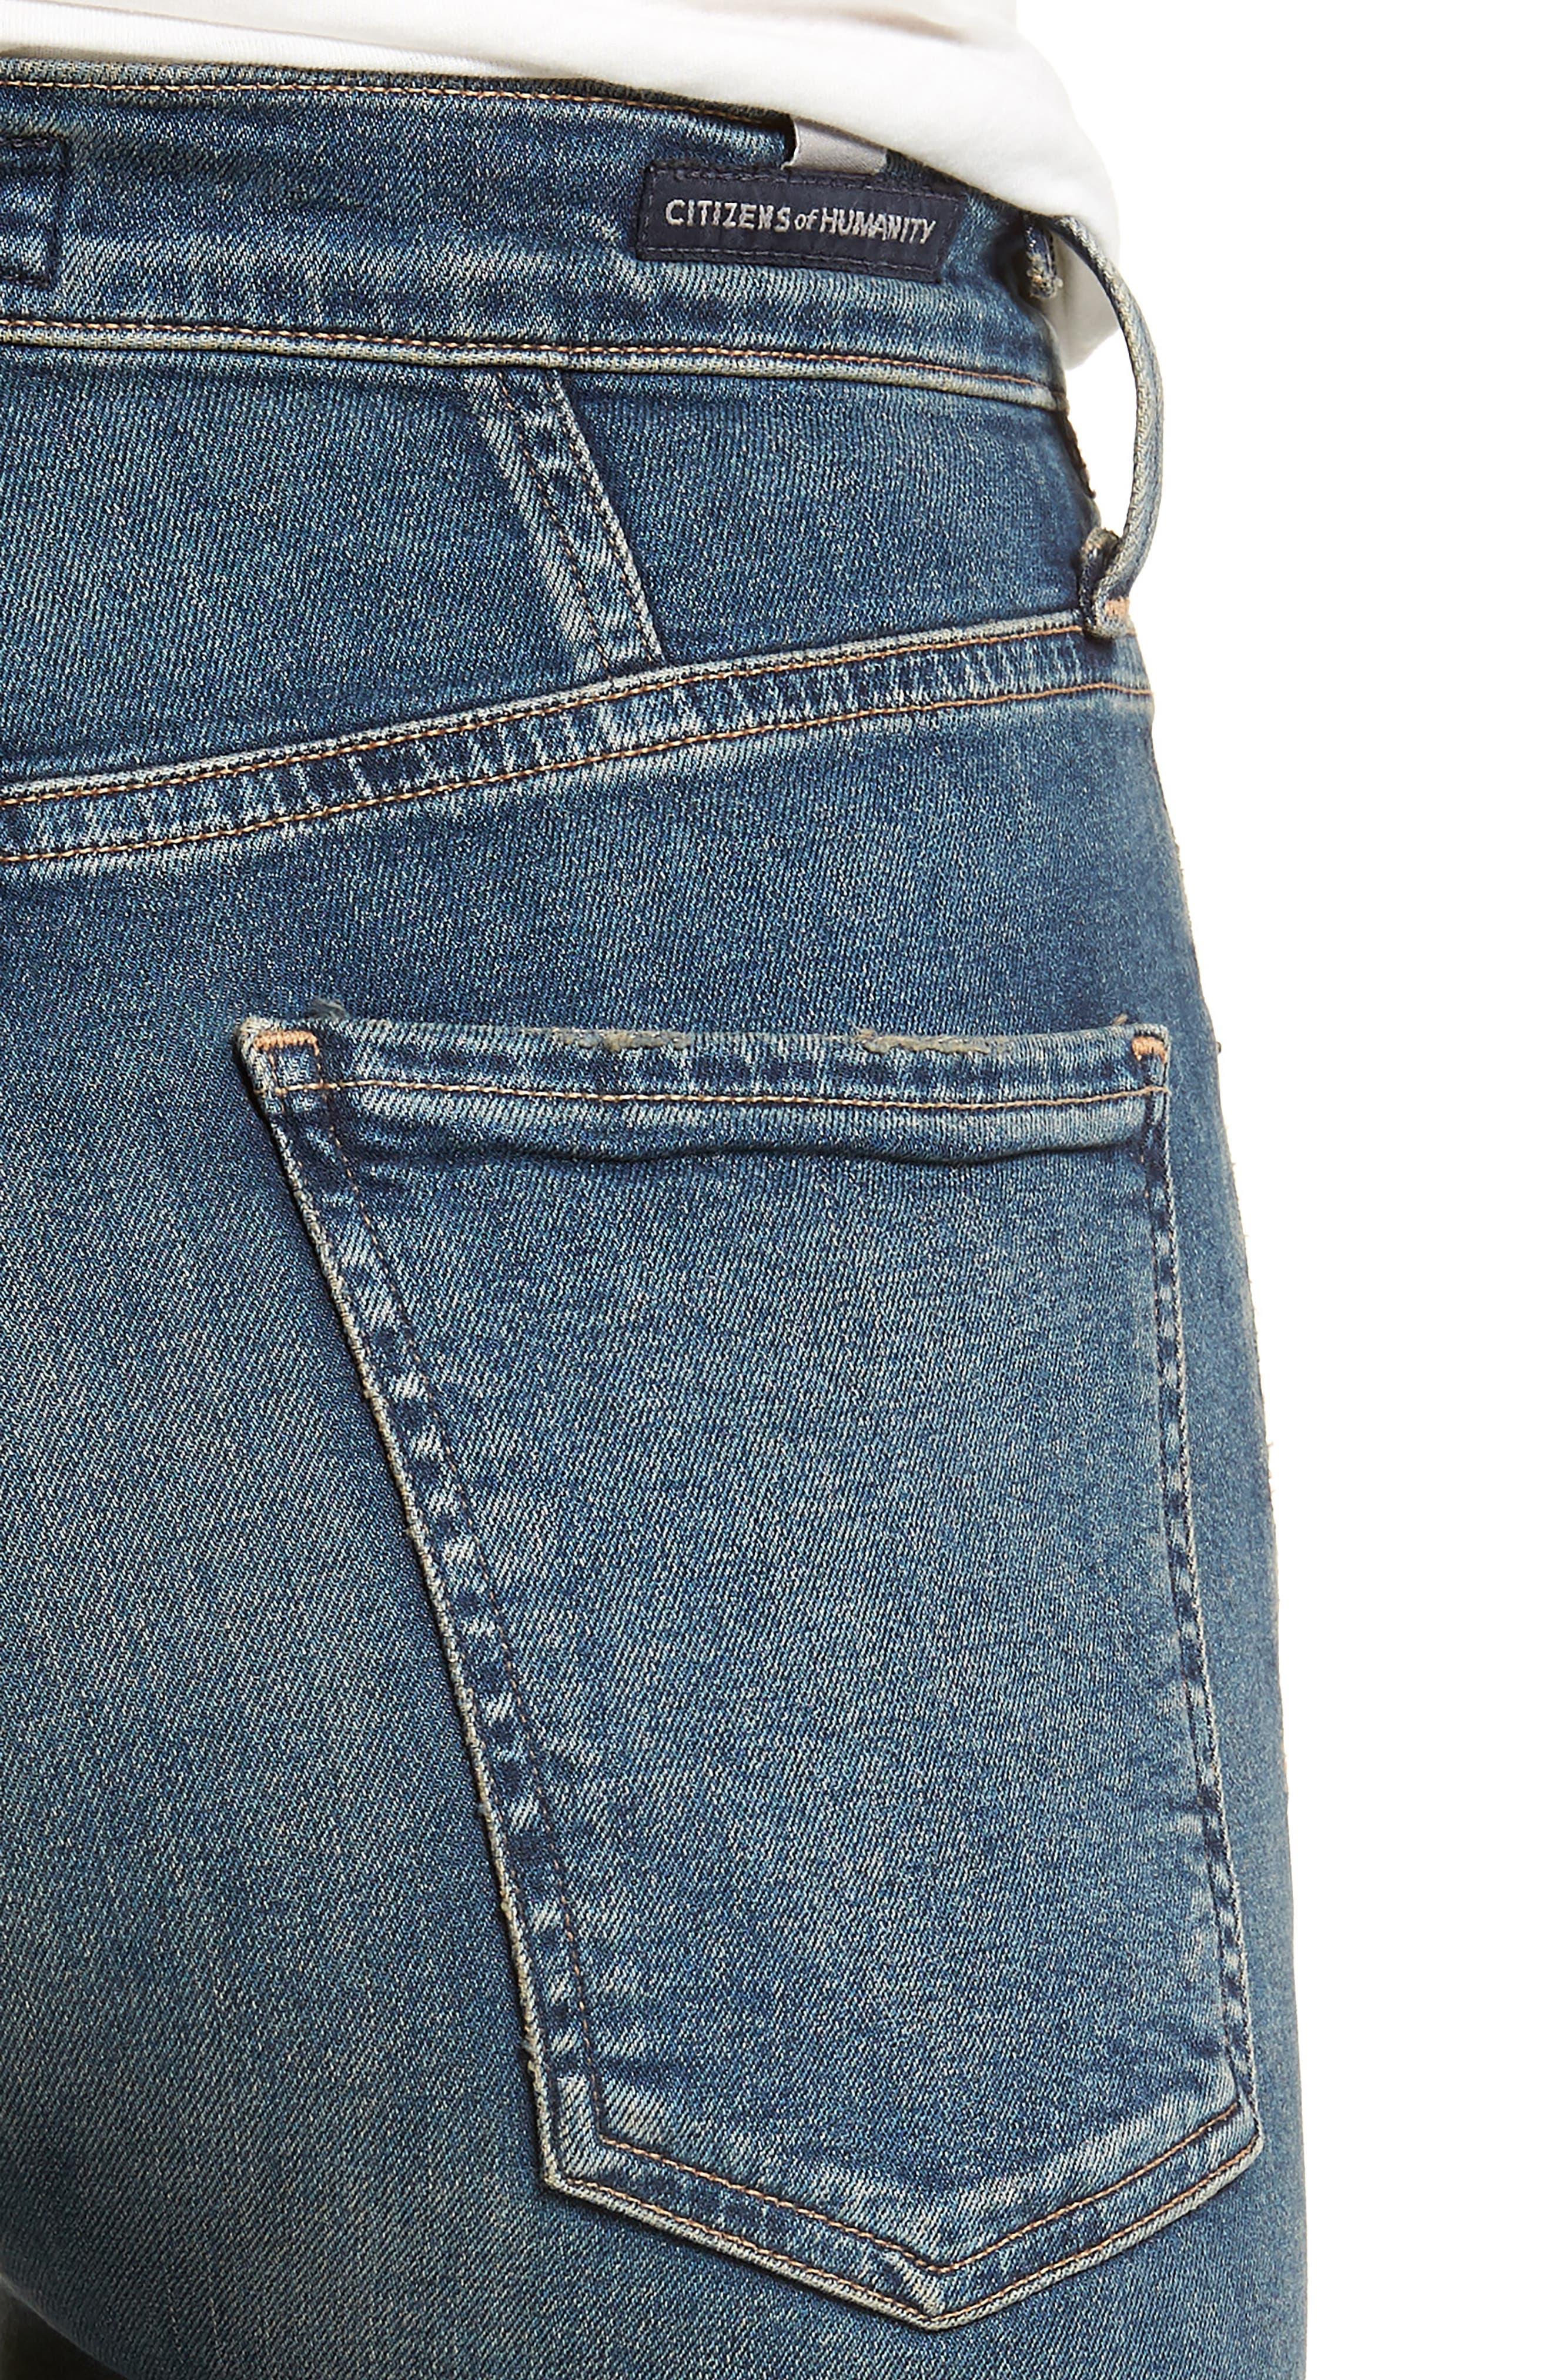 Chrissy High Waist Skinny Jeans,                             Alternate thumbnail 4, color,                             407